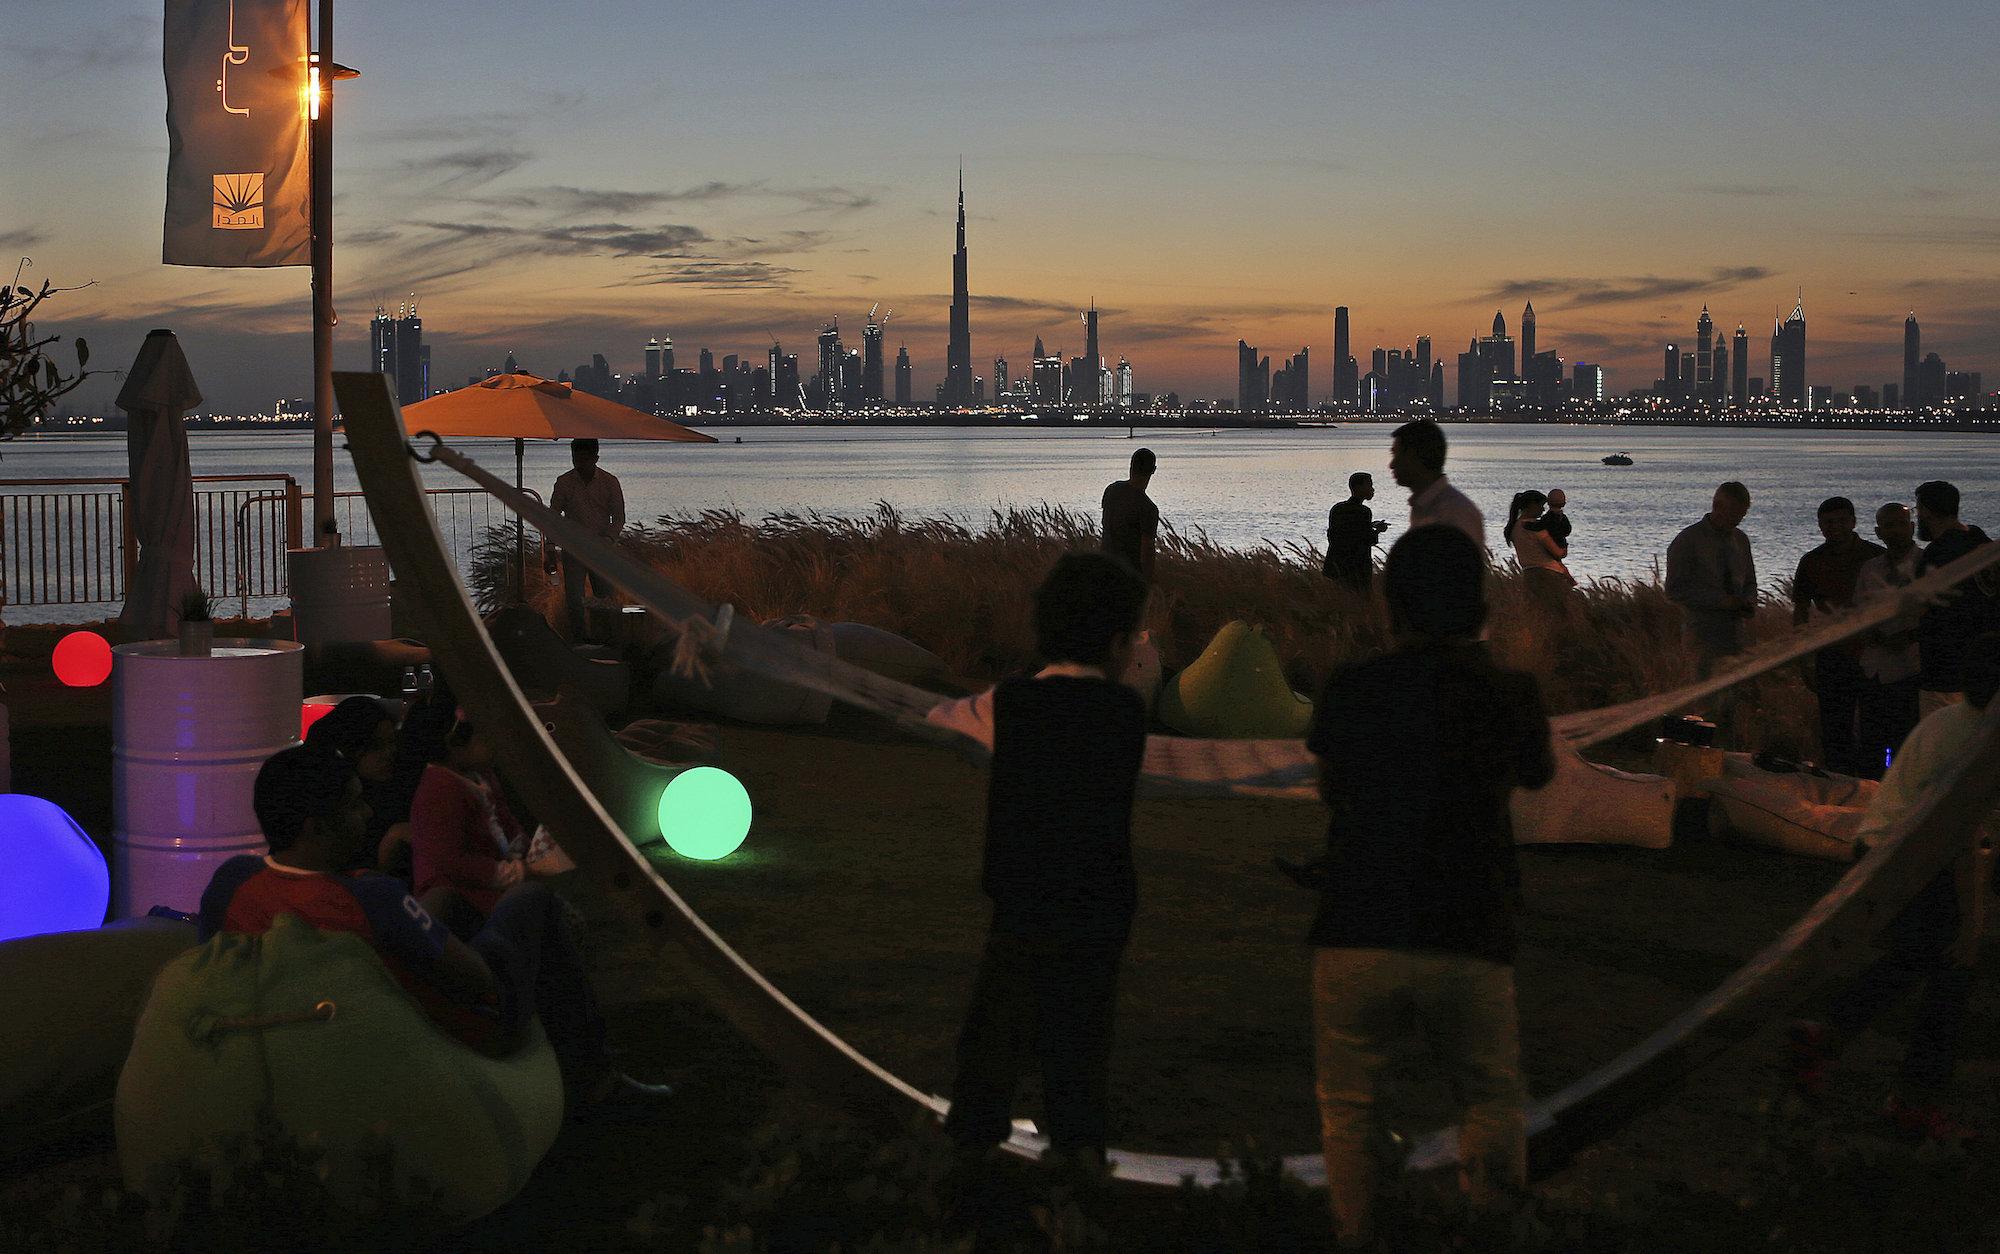 People watch the sunset over the city skyline, Dubai, United Arab Emirates, March 4, 2016. (AP Photo/Kamran Jebreili)